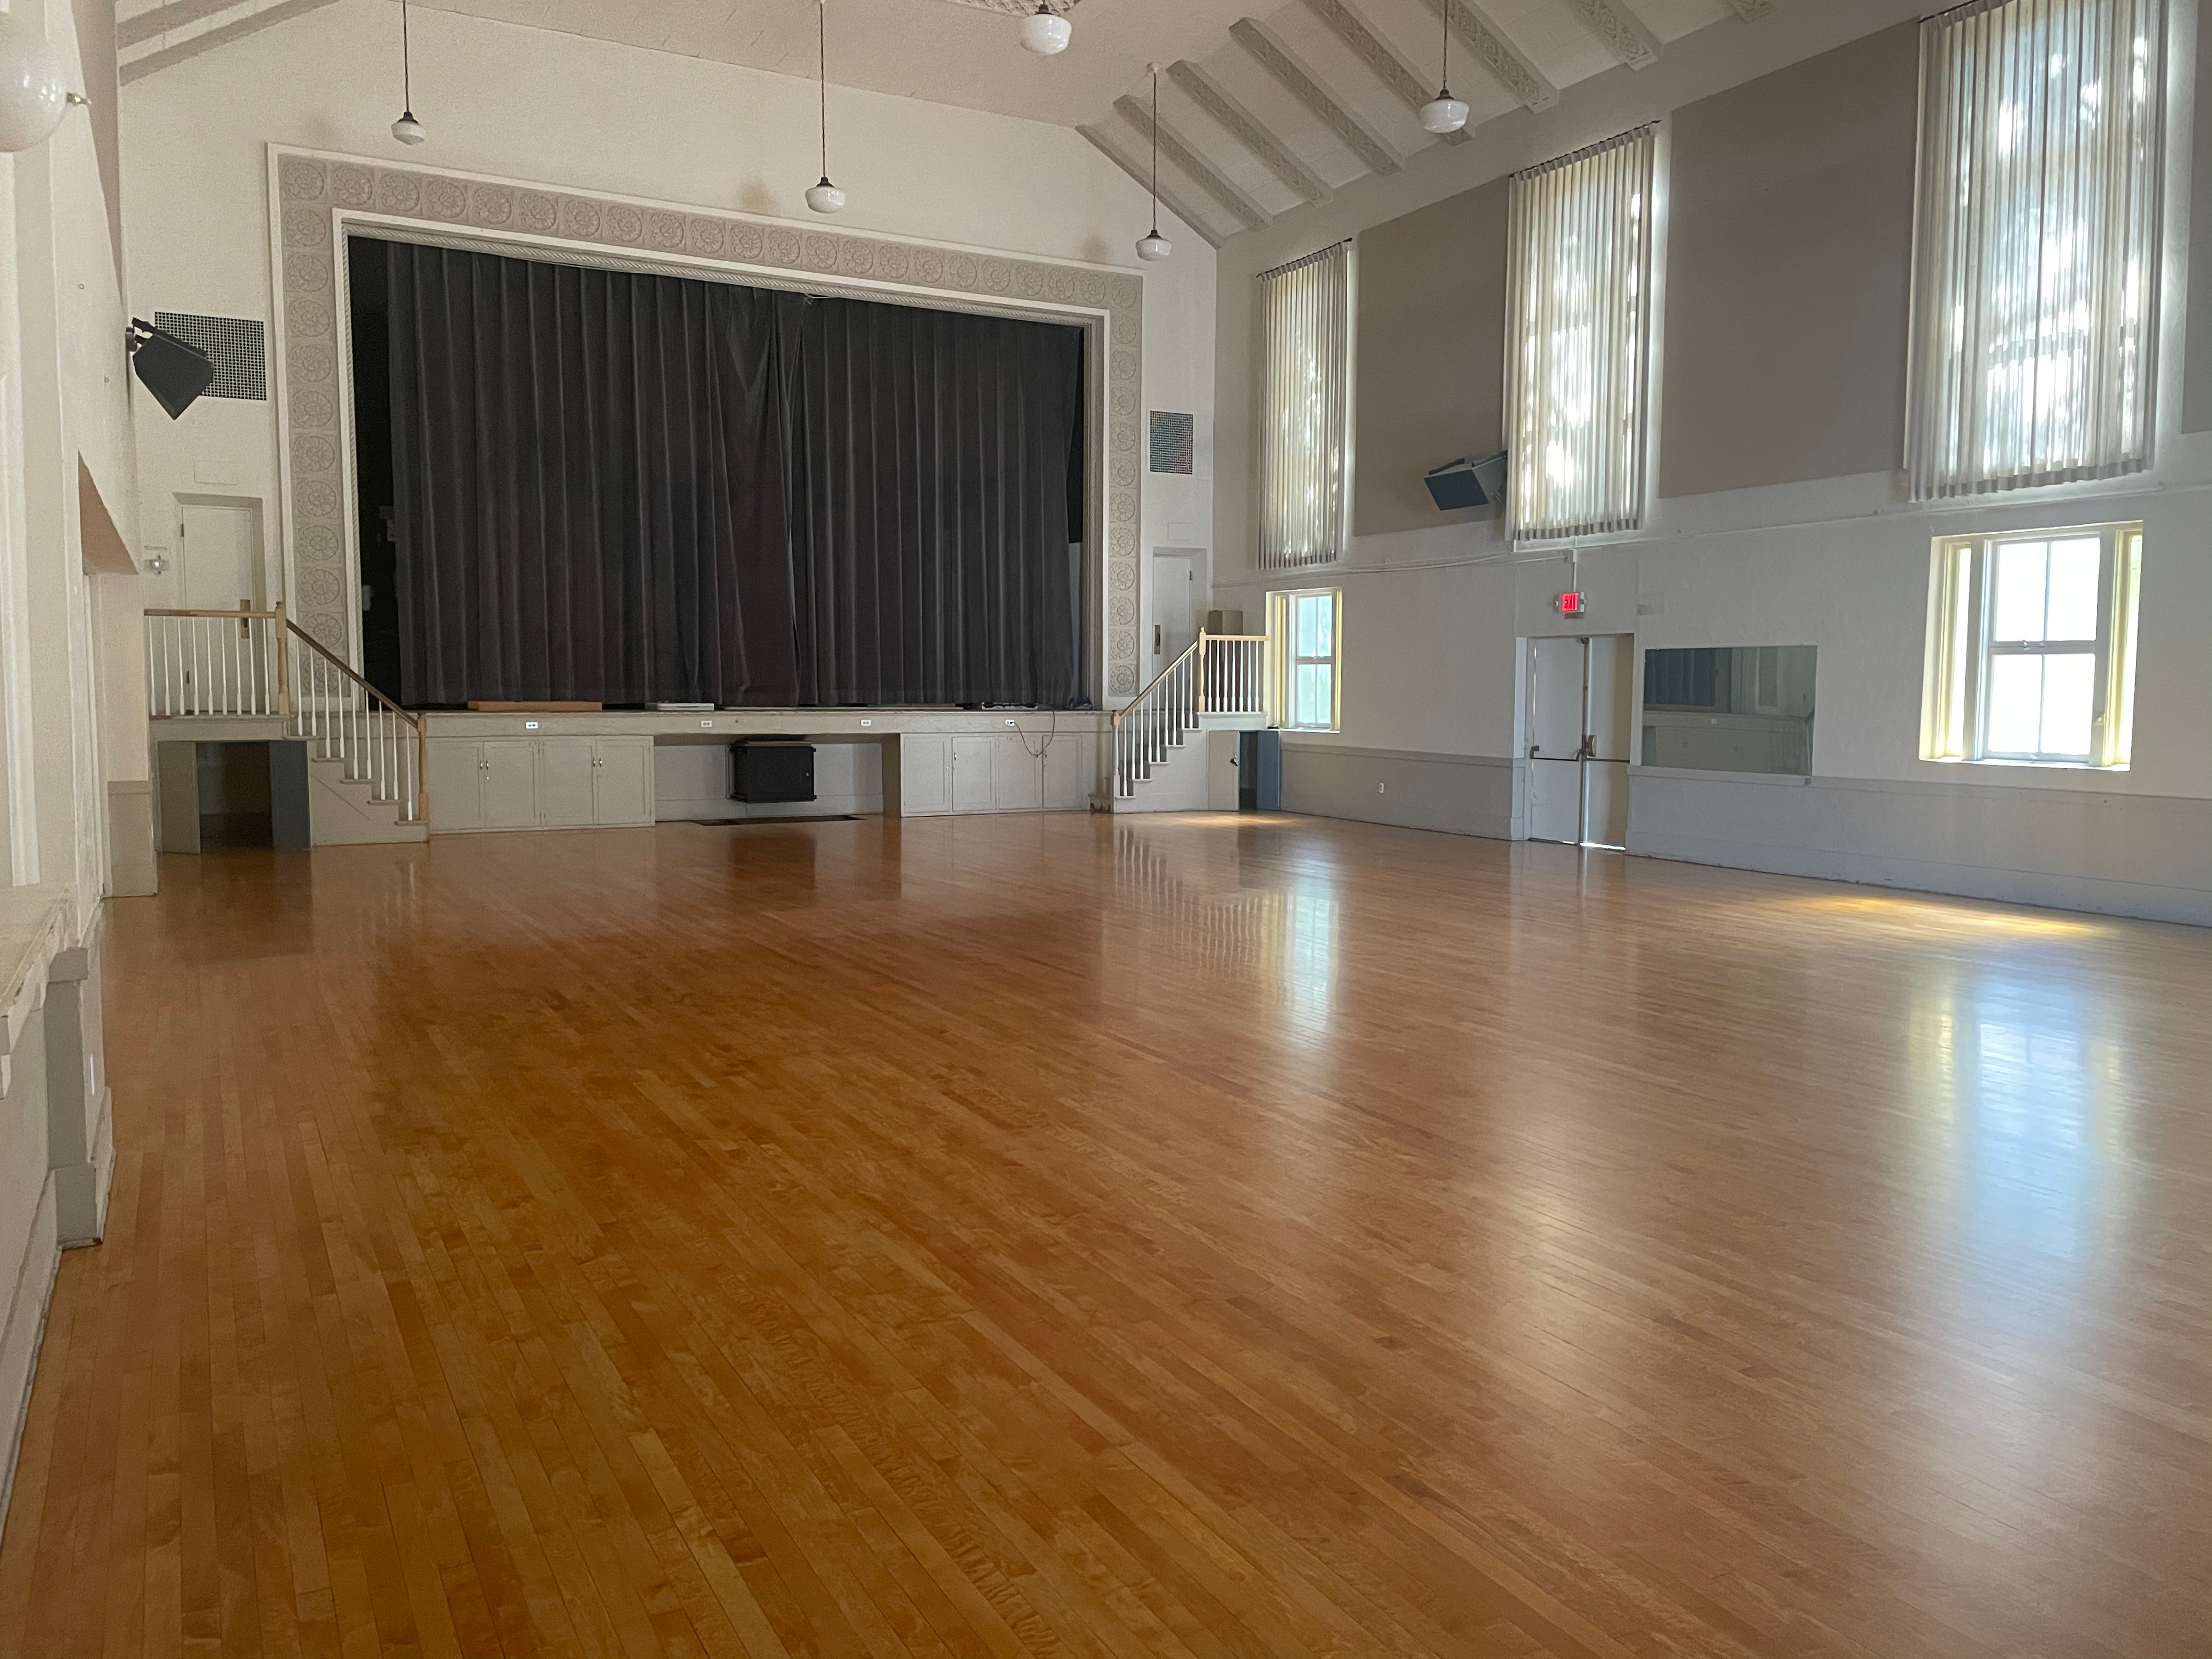 Masonic Lodge Hall Rental